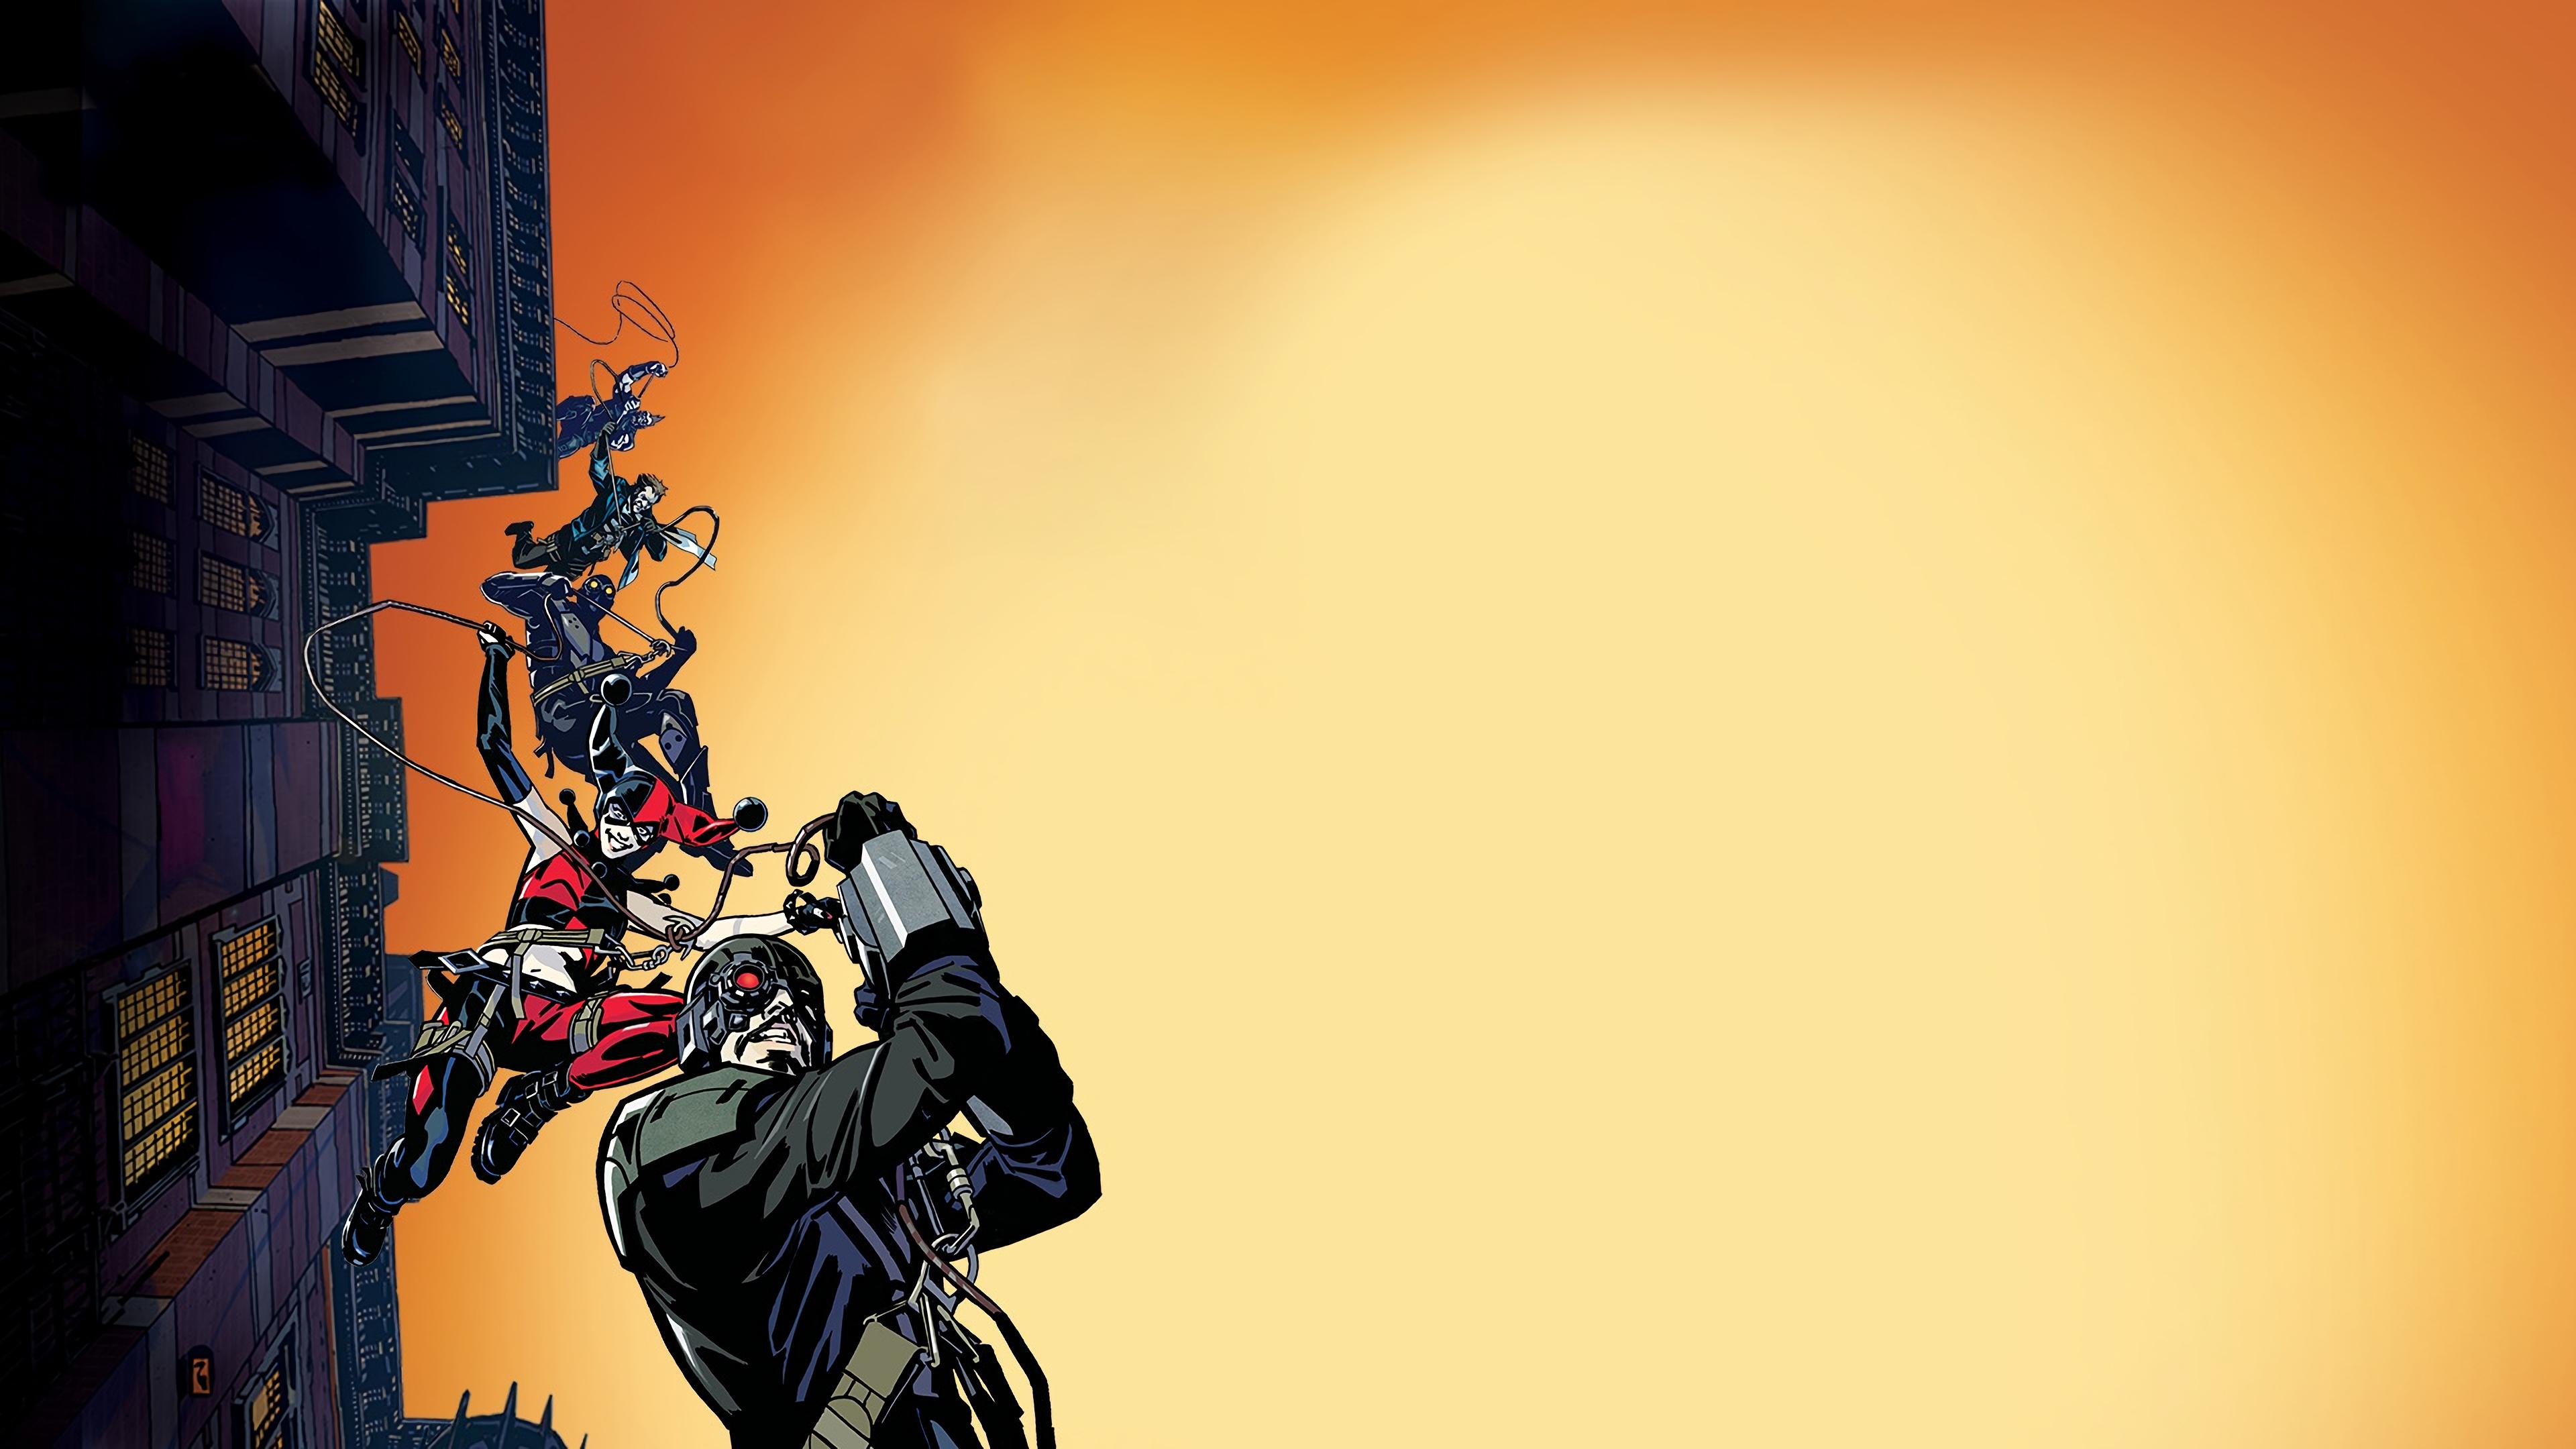 Batman Assault On Arkham 4k Hd Superheroes 4k Wallpapers Images